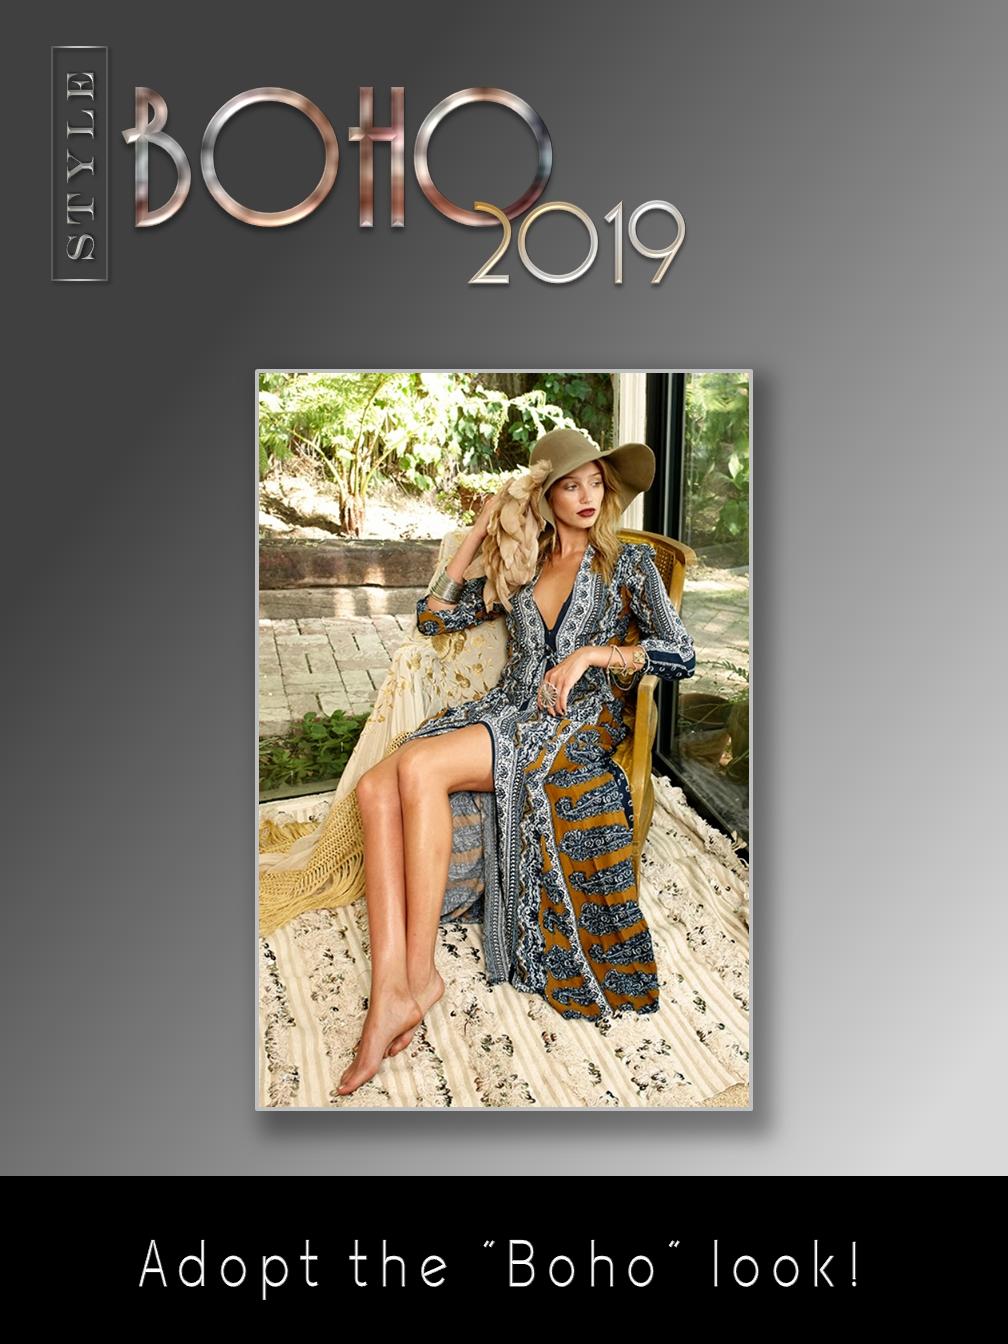 Boho 2019